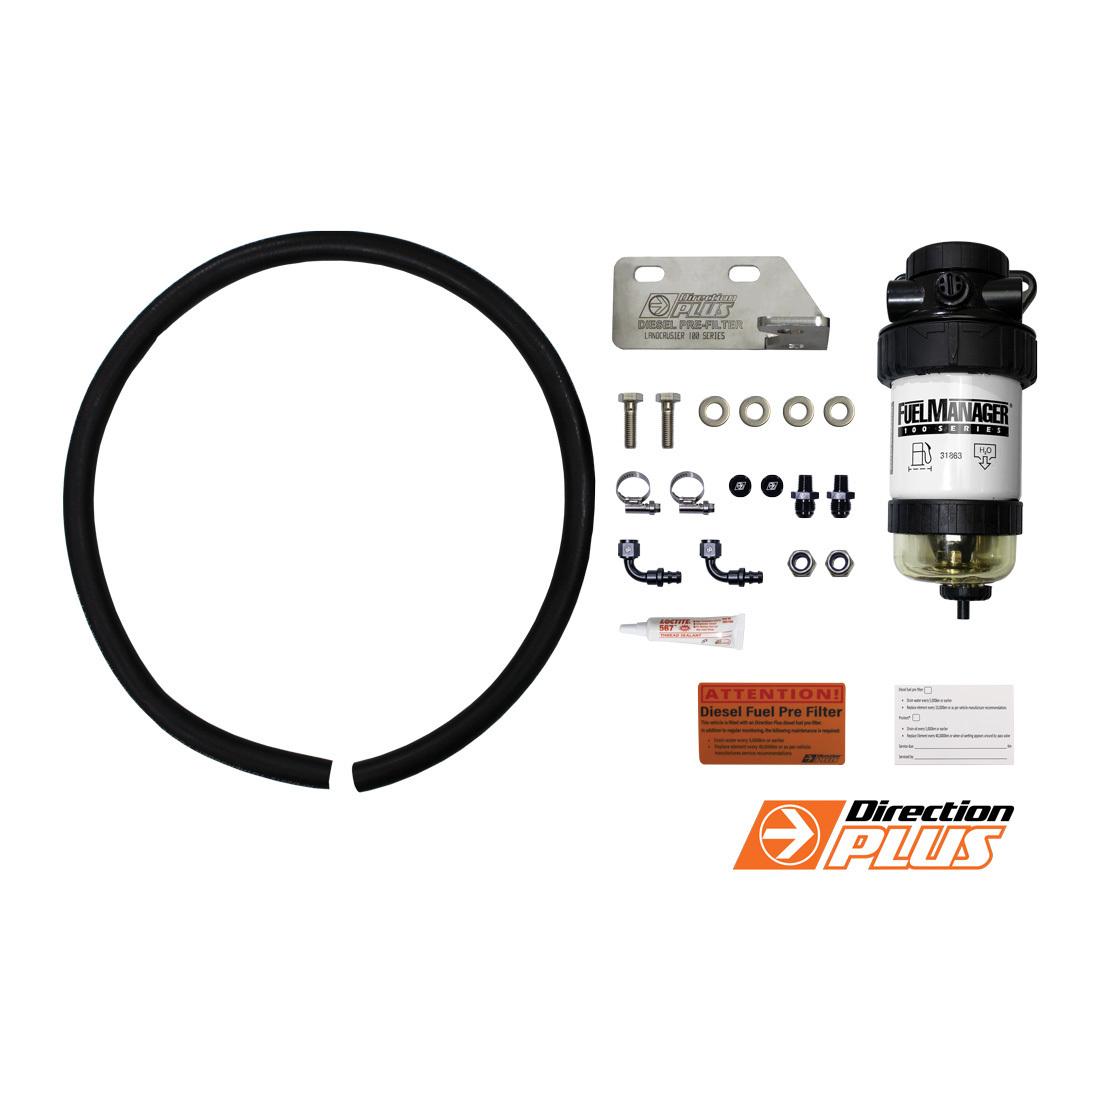 Diesel Fuel Filtration Sock : Diesel fuel filter water separator toyota landcruiser